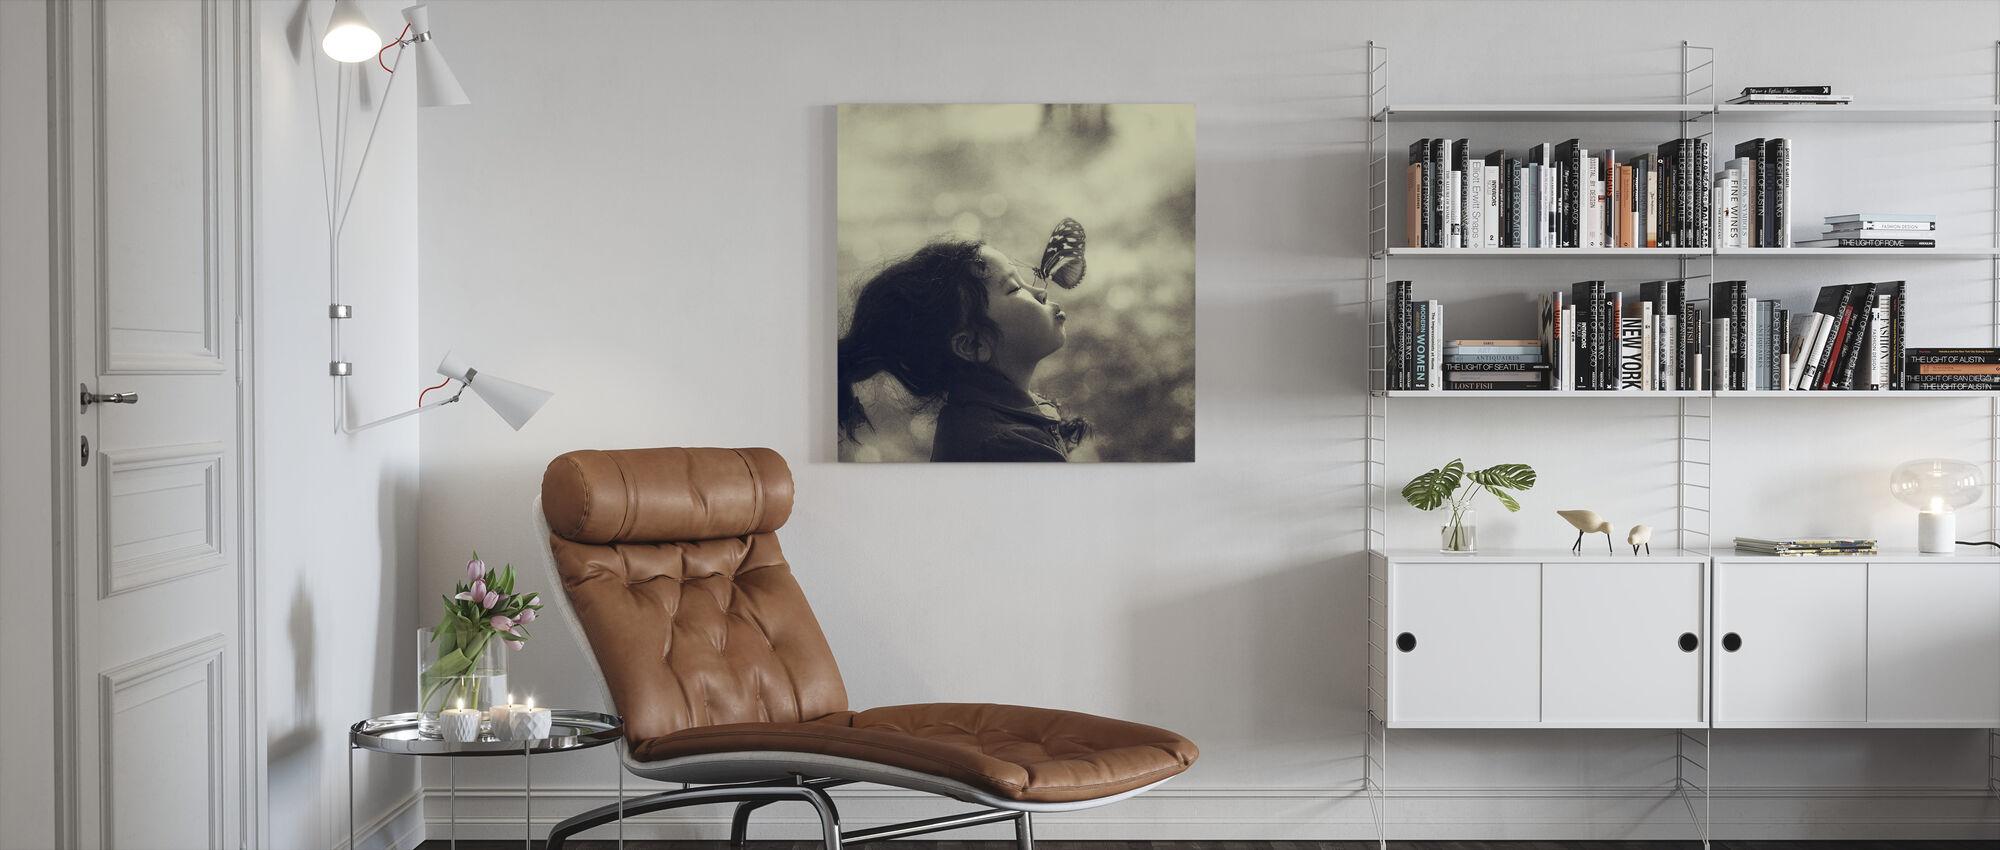 New Friend - Canvas print - Living Room